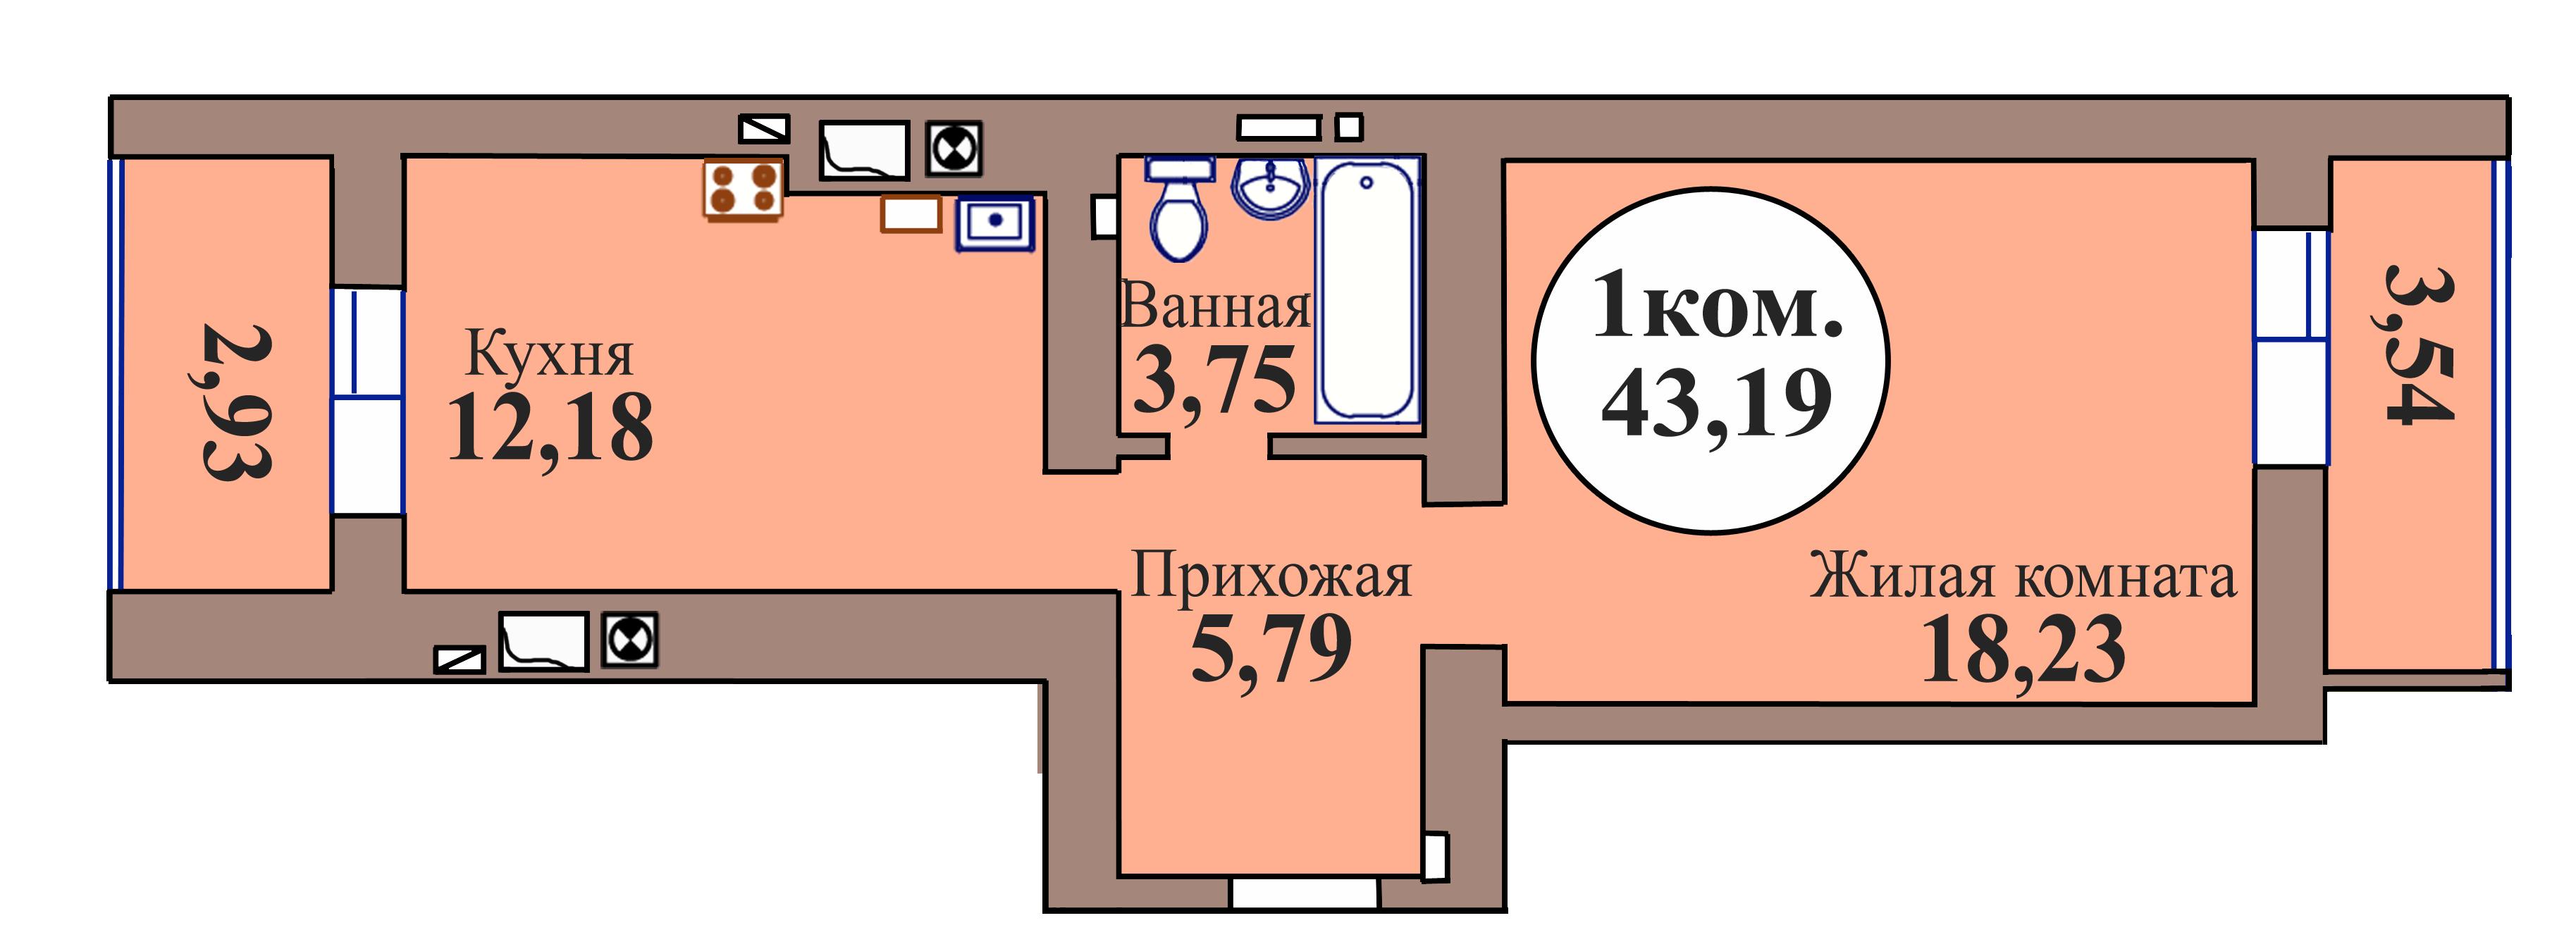 1-комн. кв. по пер. Калининградский, 5 кв. 71 в Калининграде